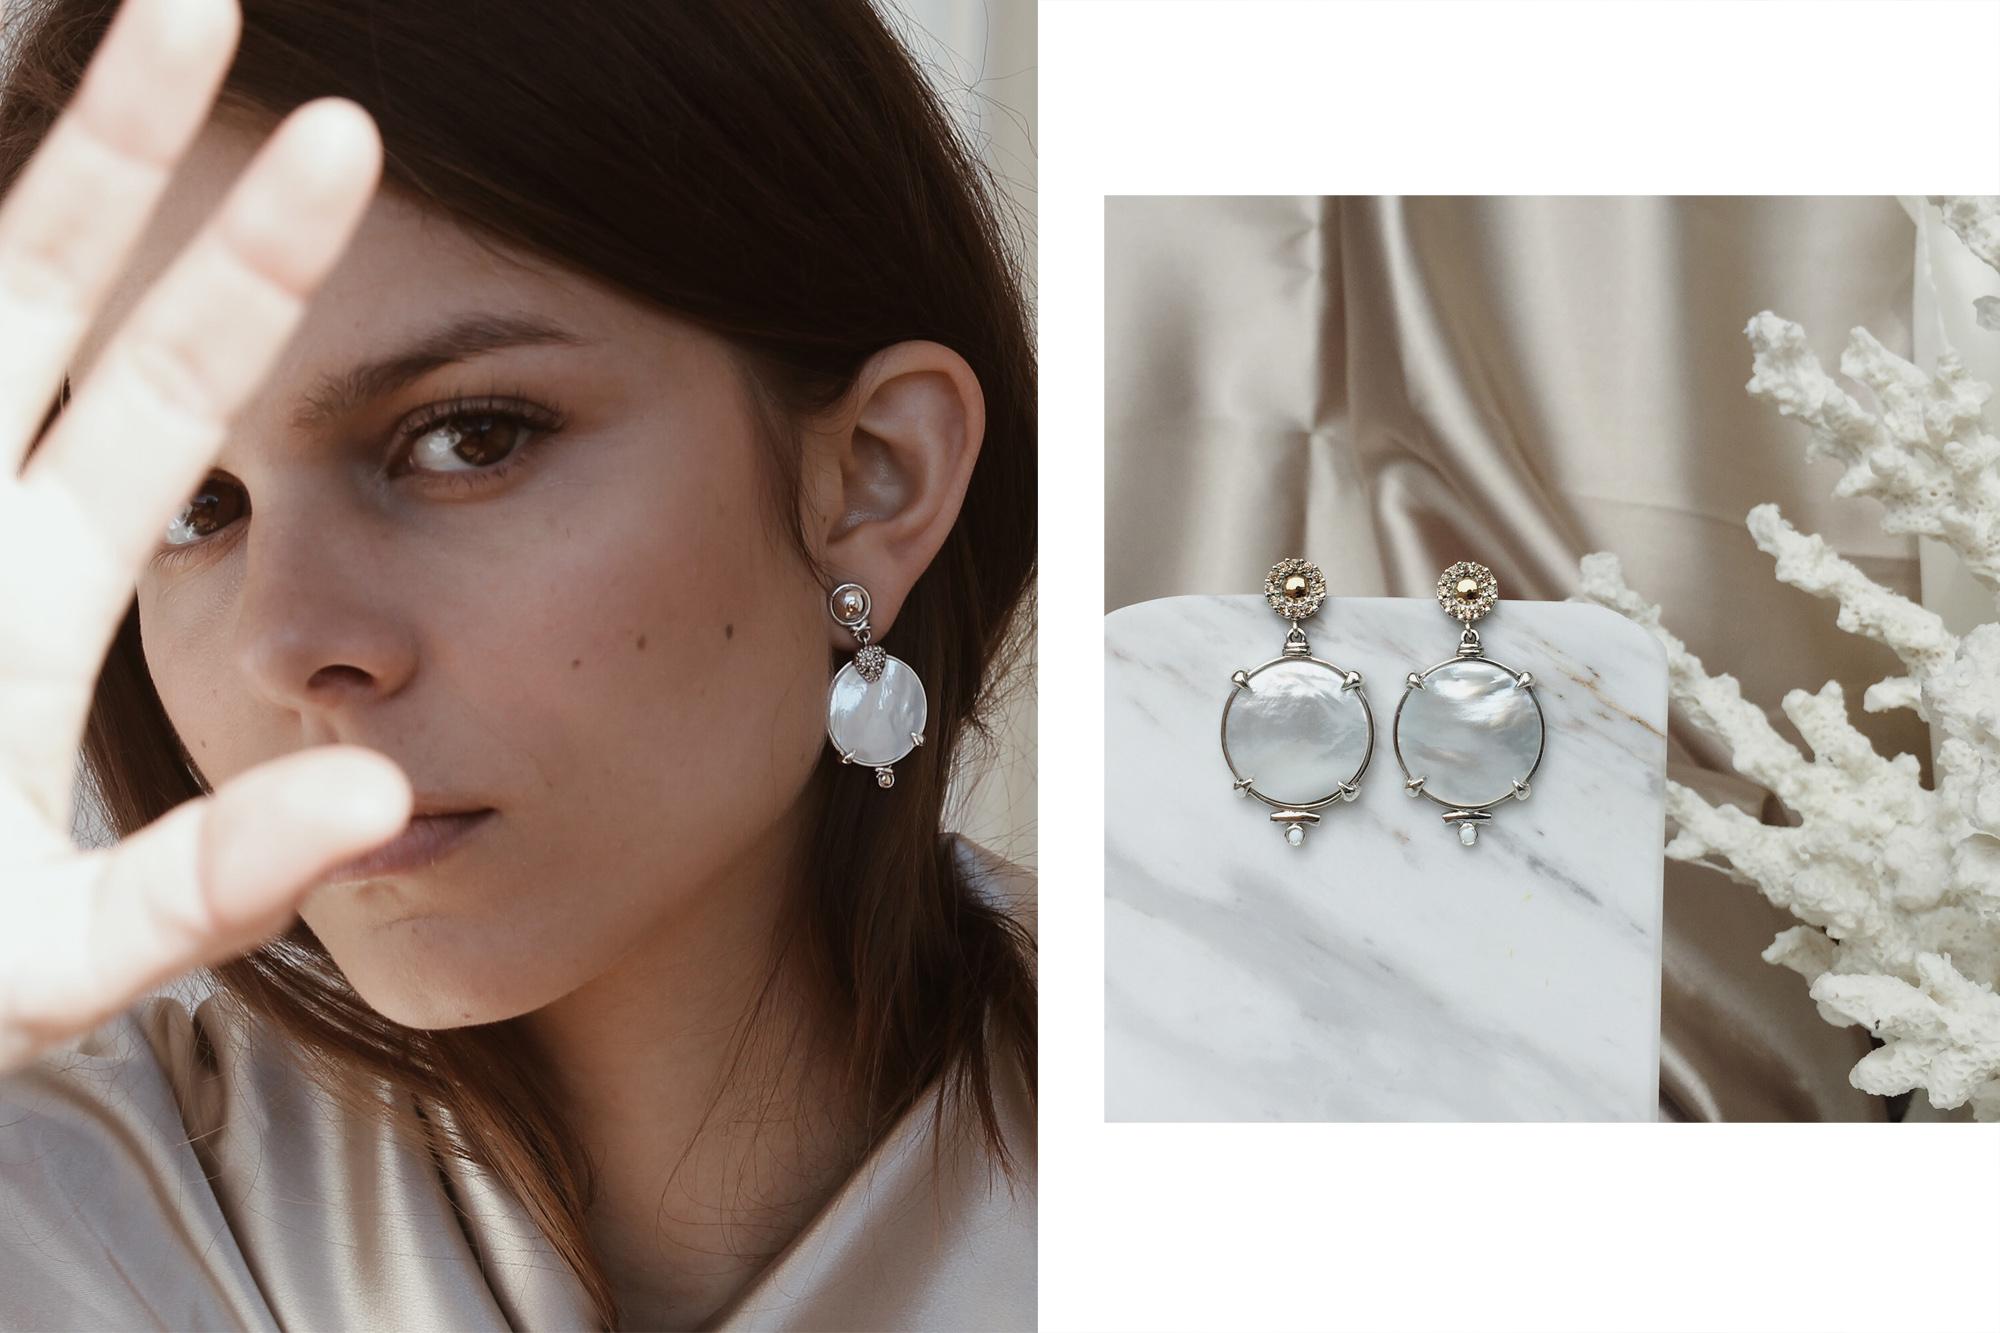 xdc_parhelia_earrings_1.jpg